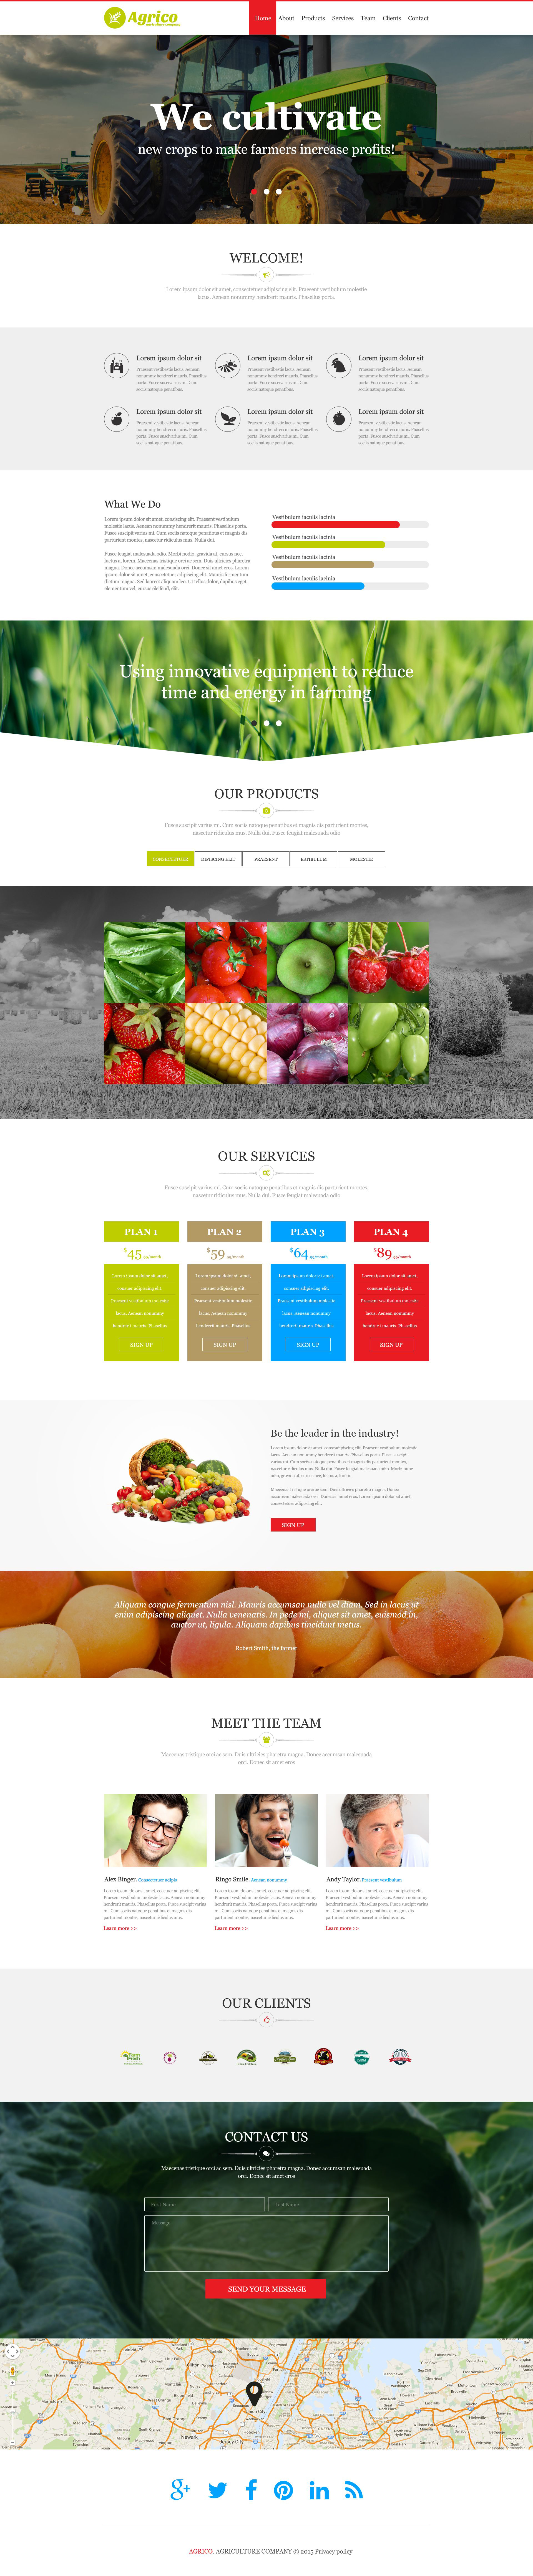 Muse шаблон на тему agriculture templates №52629